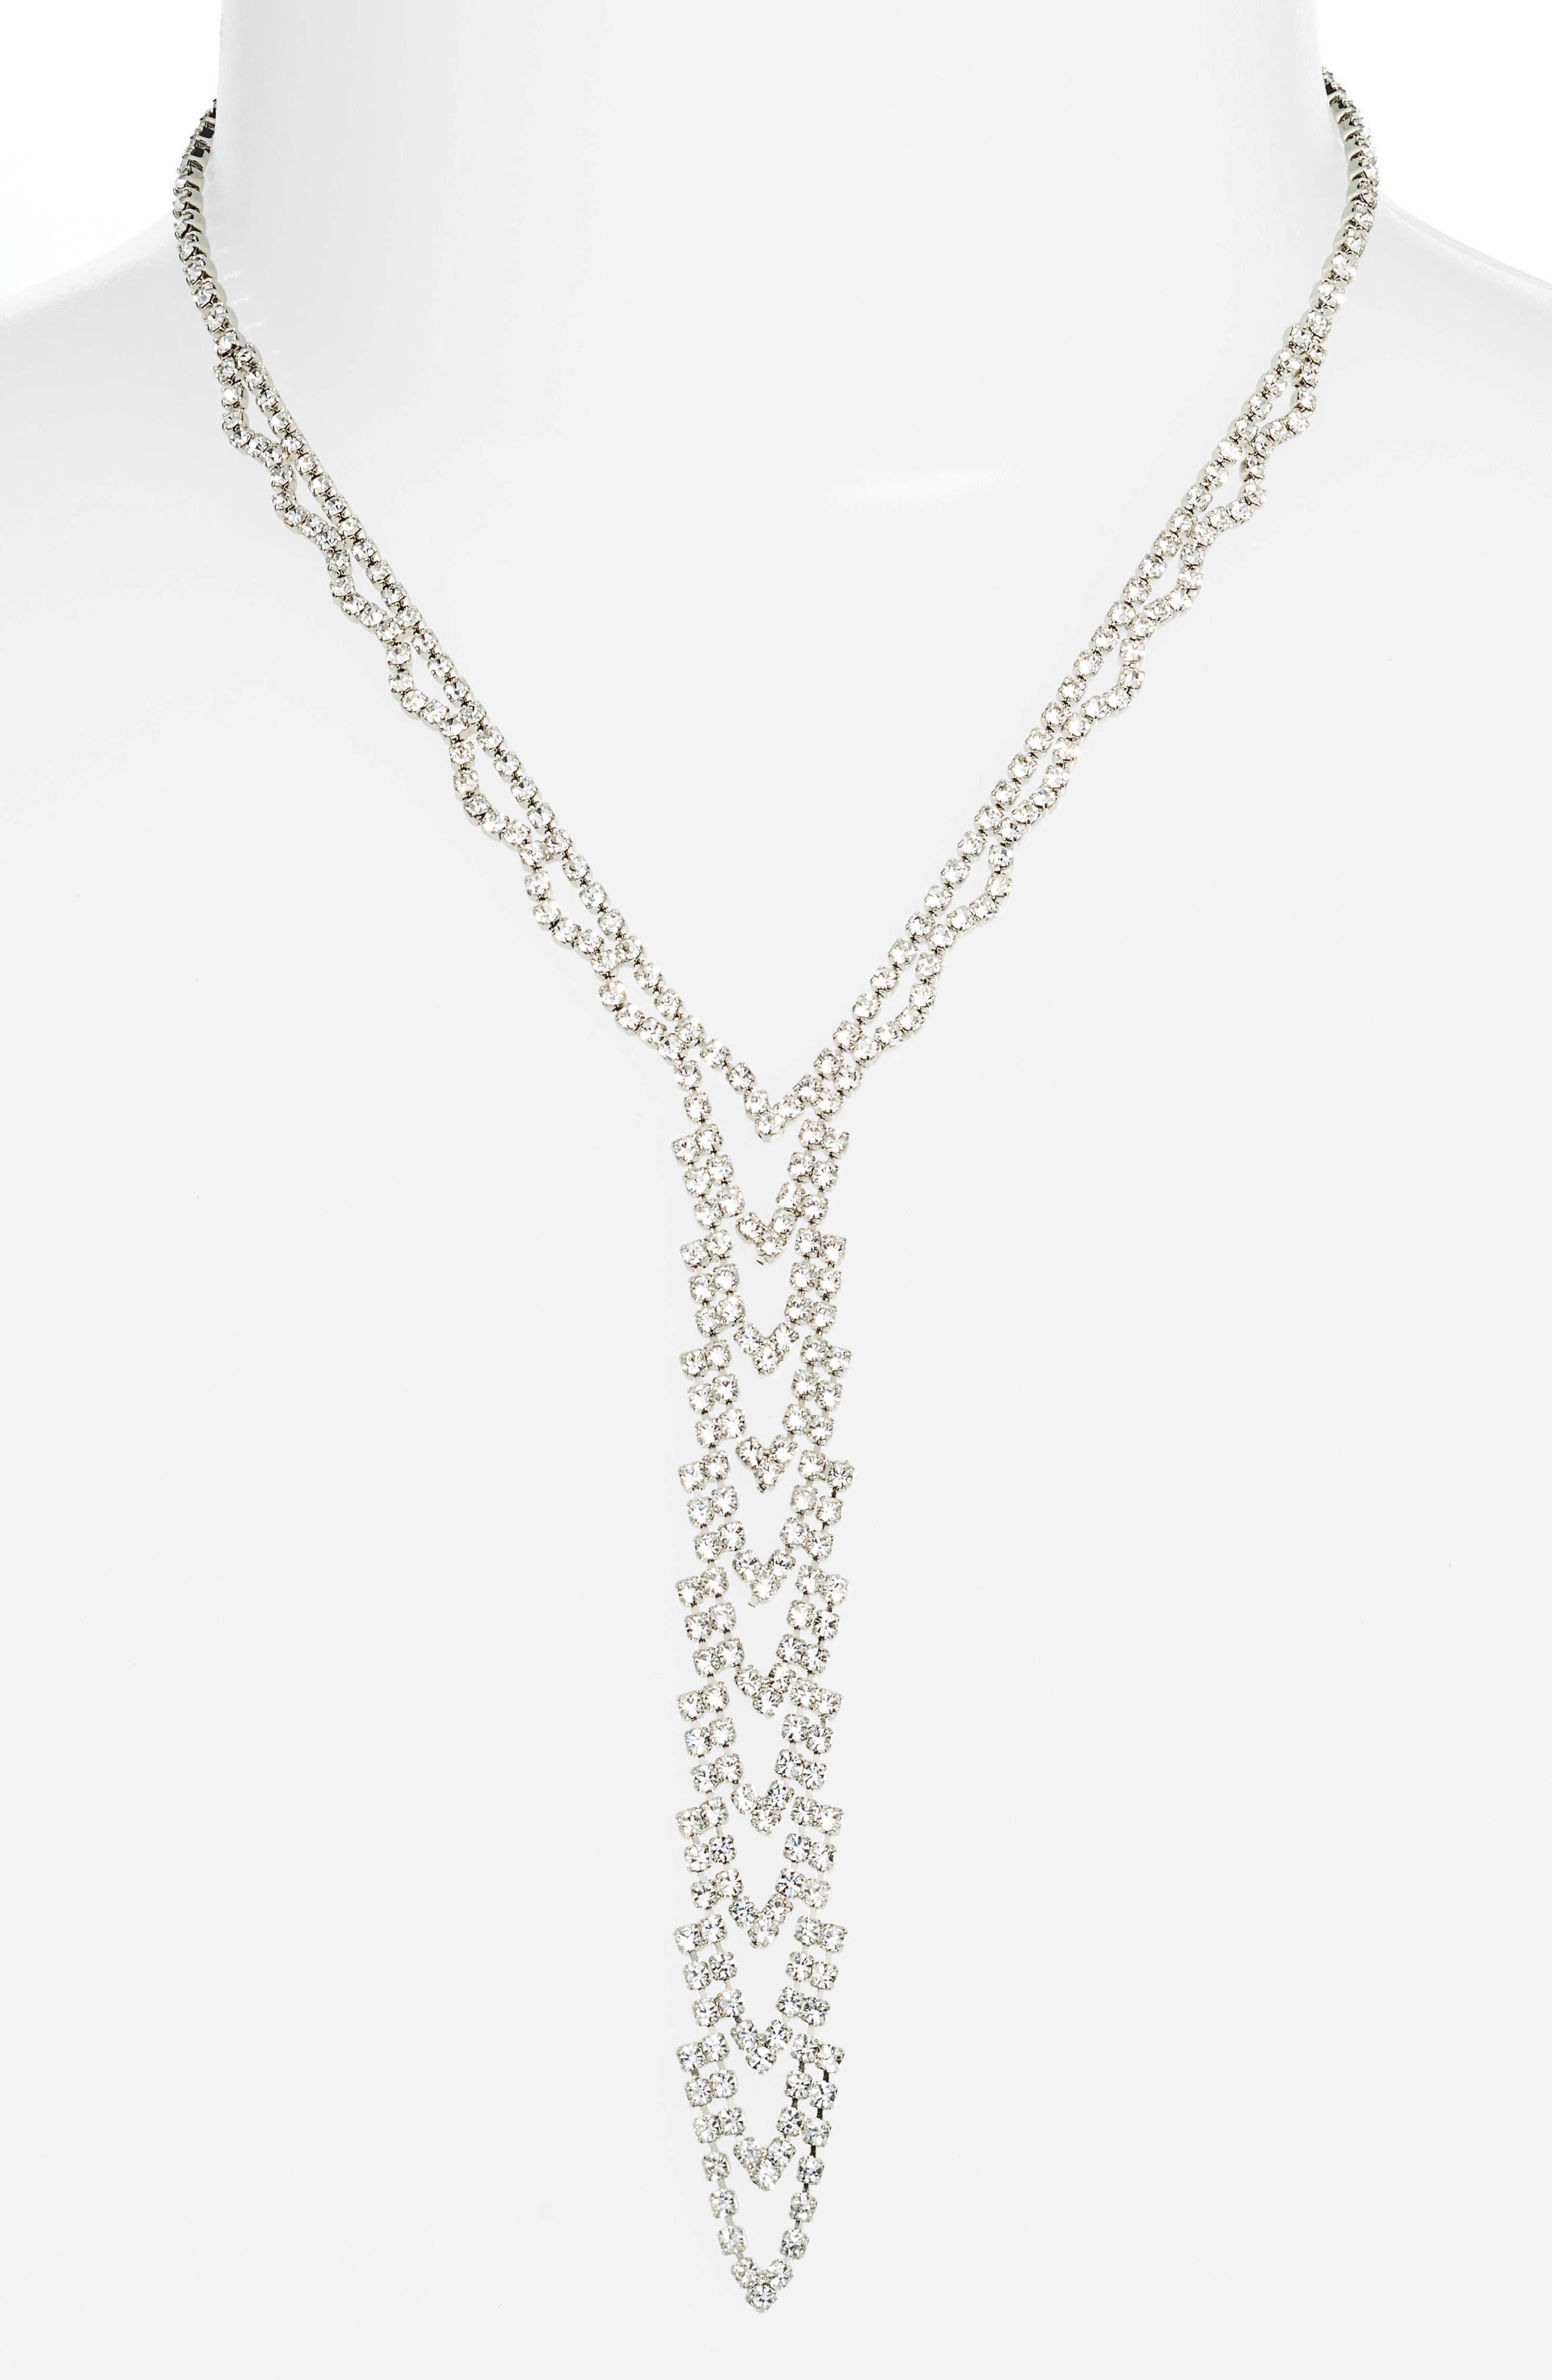 Main Image - CRISTABELLE Crystal Ladder Necklace